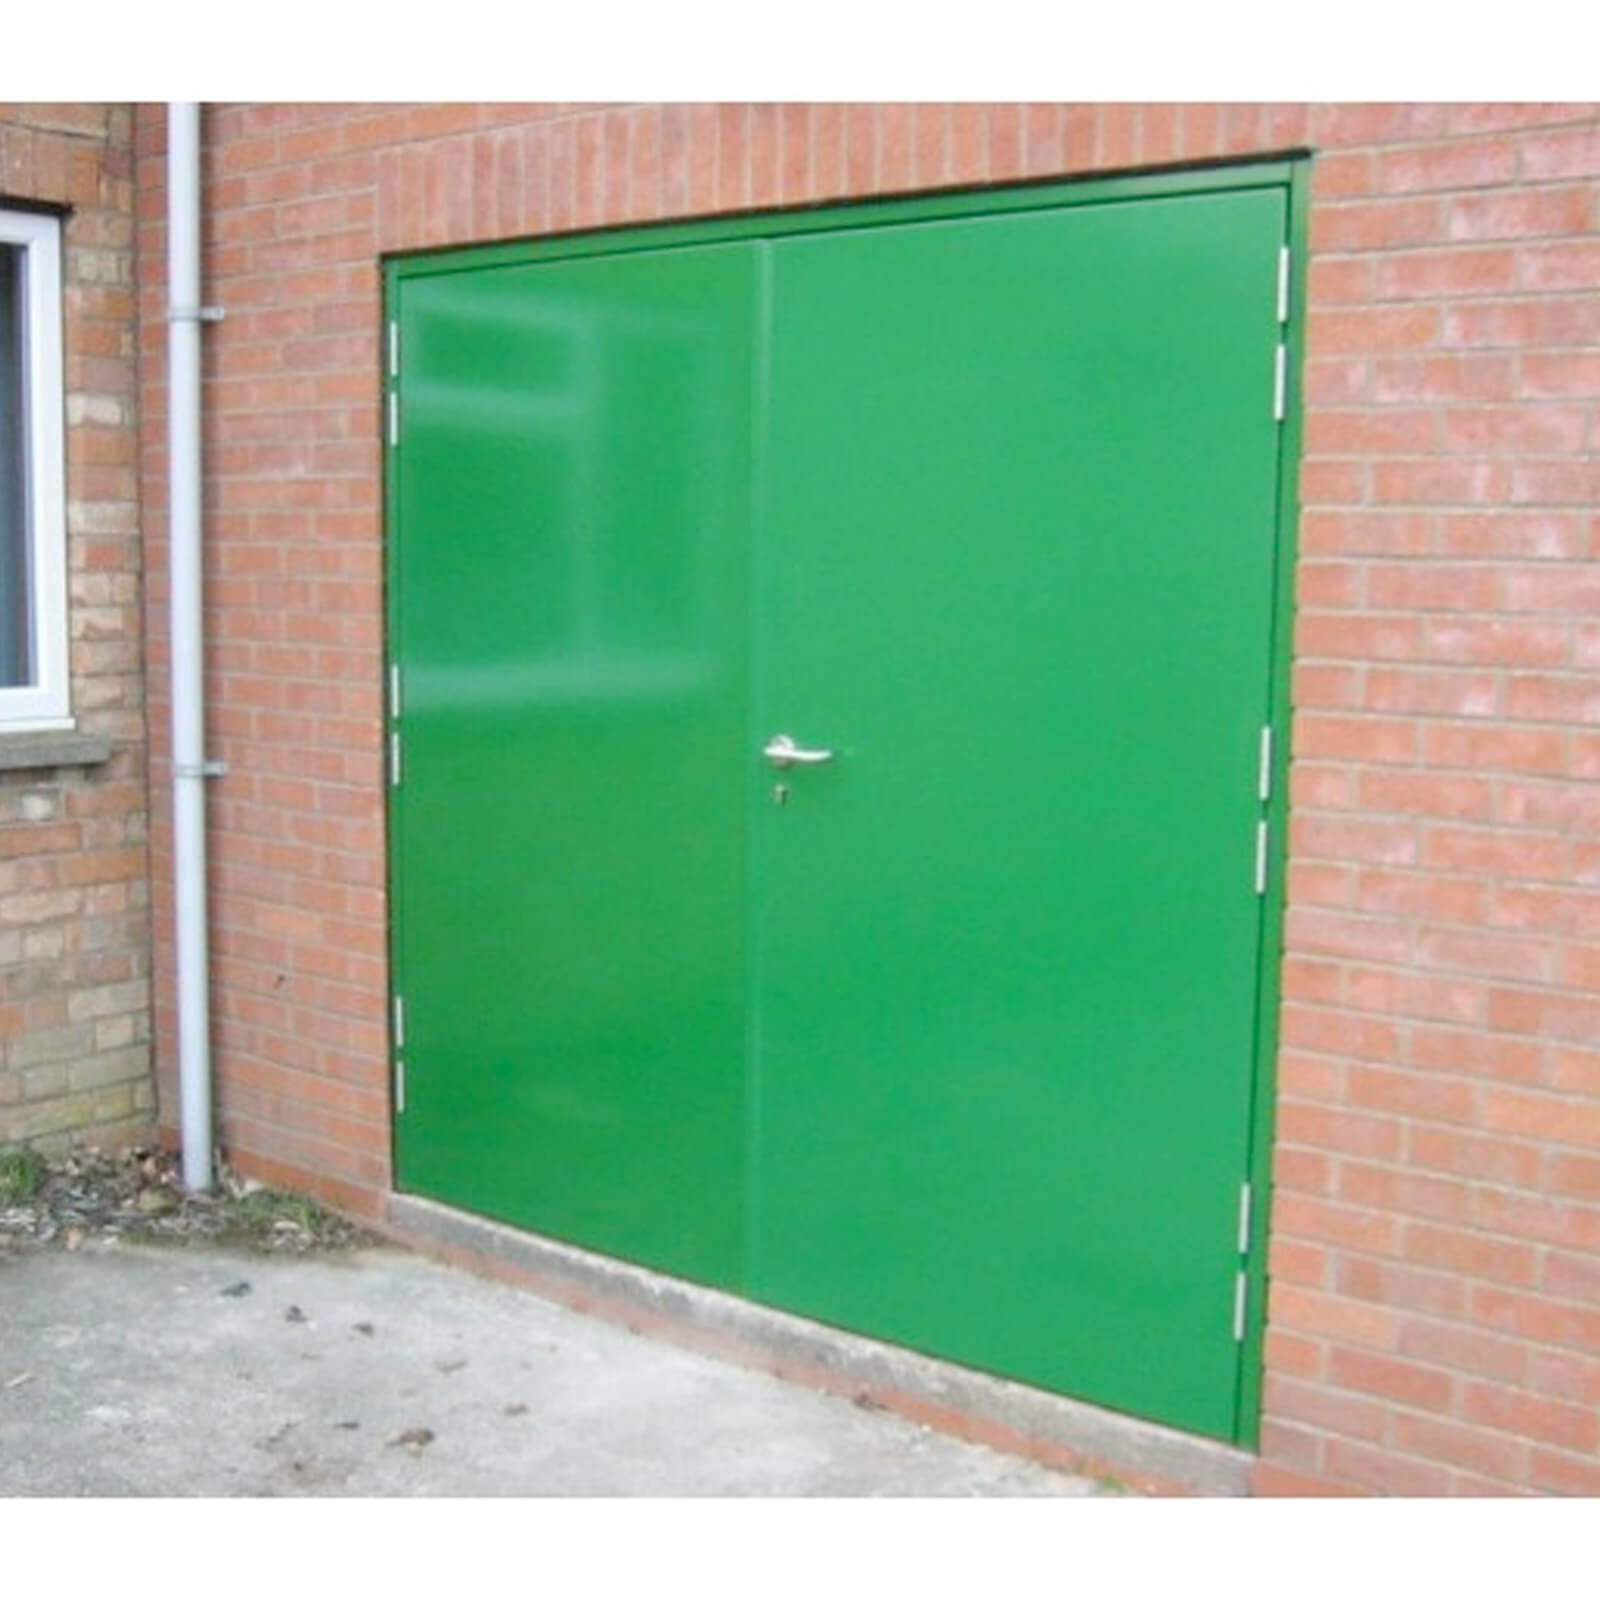 Dda Double Doors & 16.5071 M60Vip/M16 Double Leaf